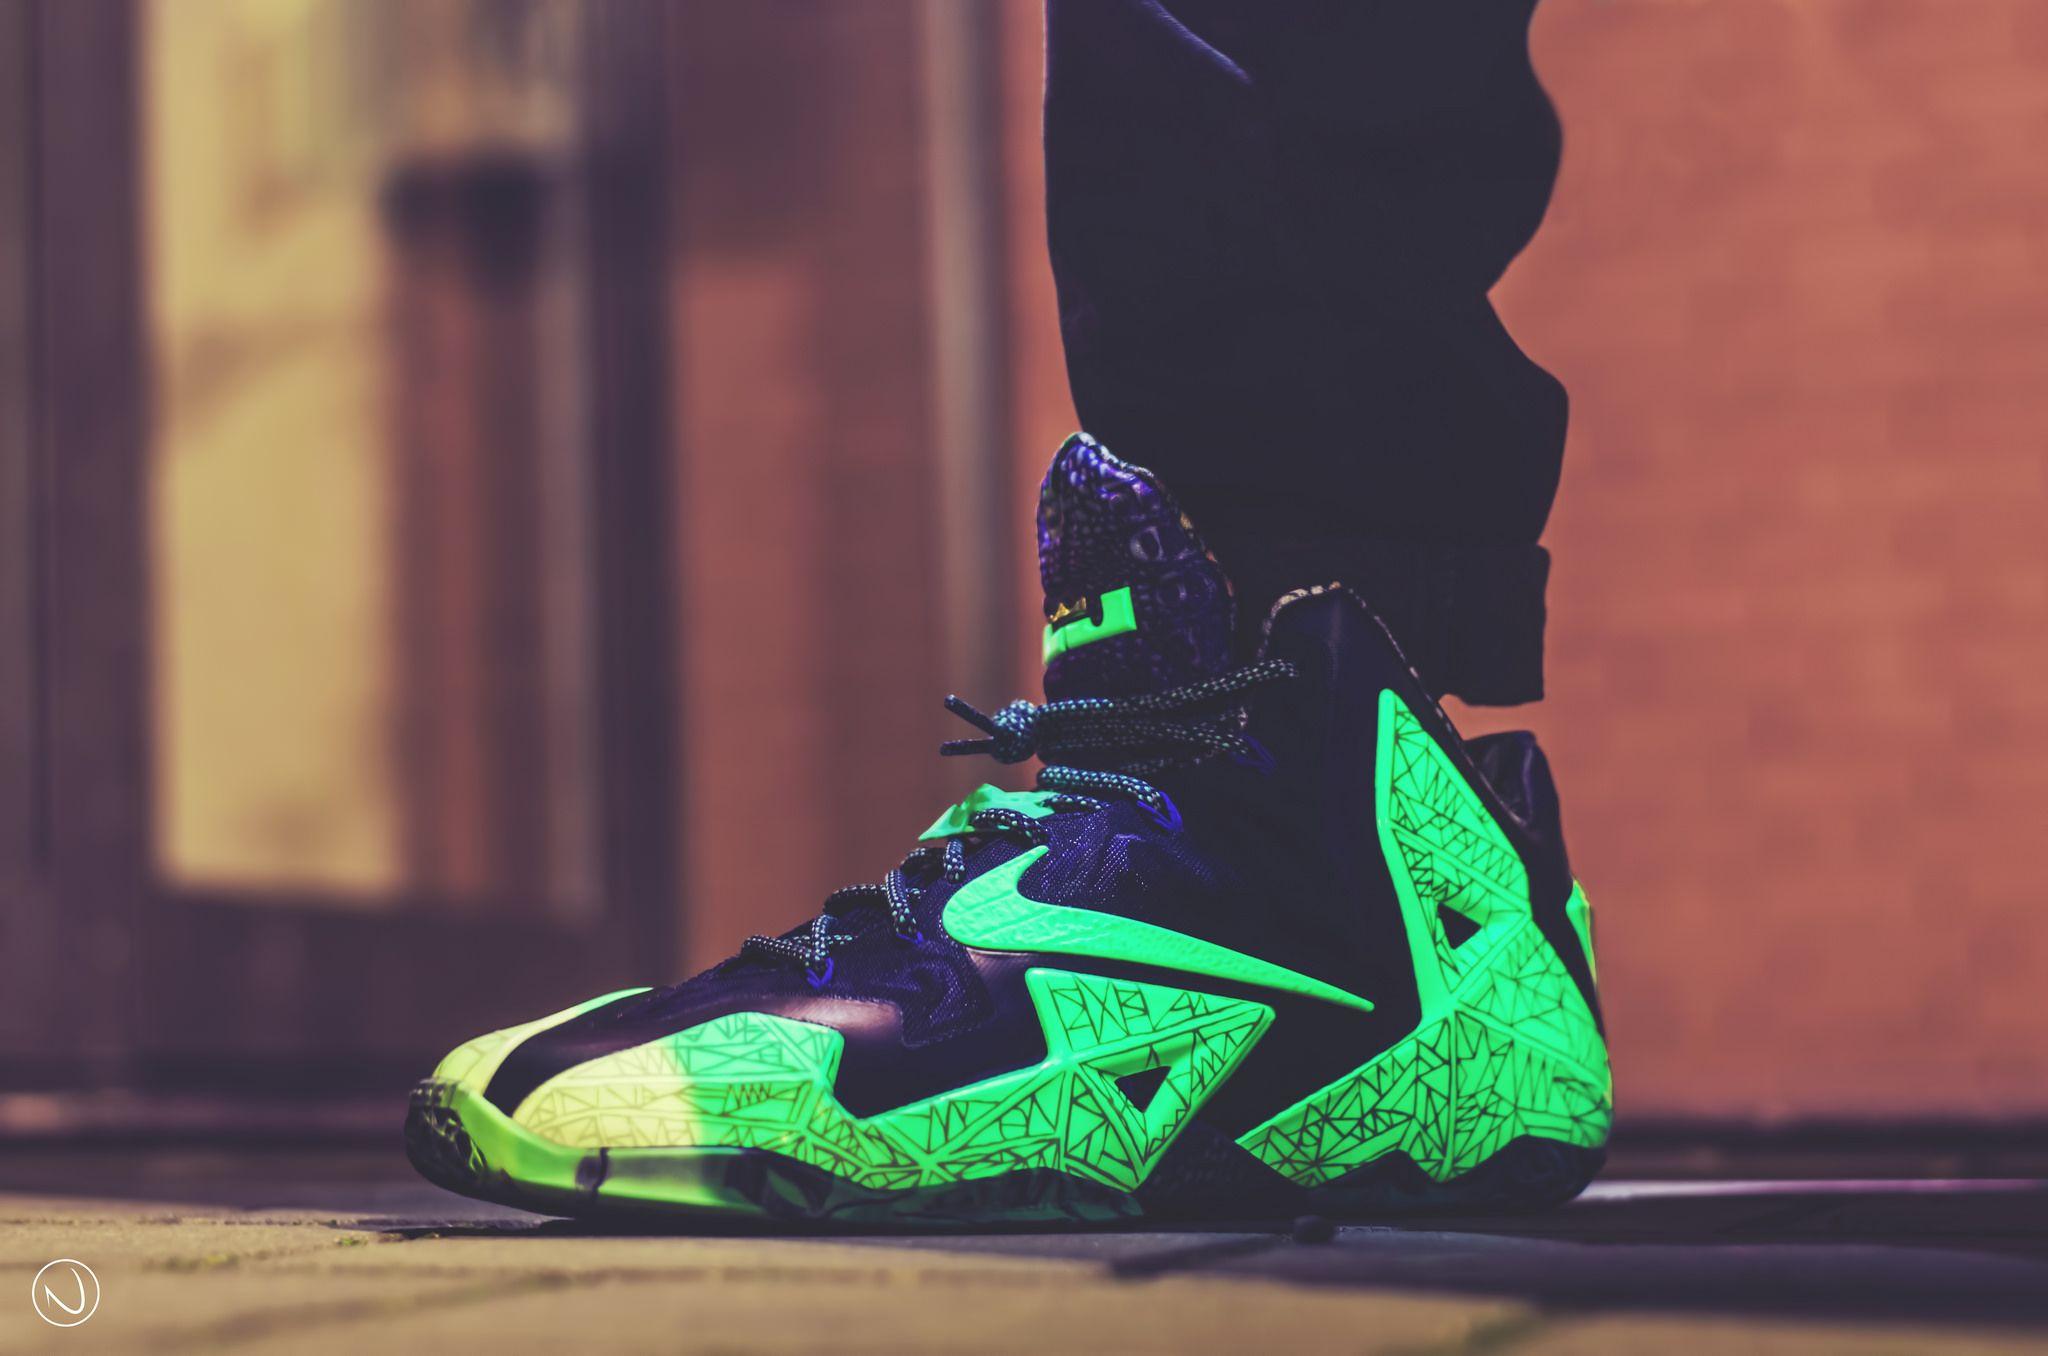 buy popular 1a4a1 04397 Nike LeBron 11 All Star NOLA Gumbo League